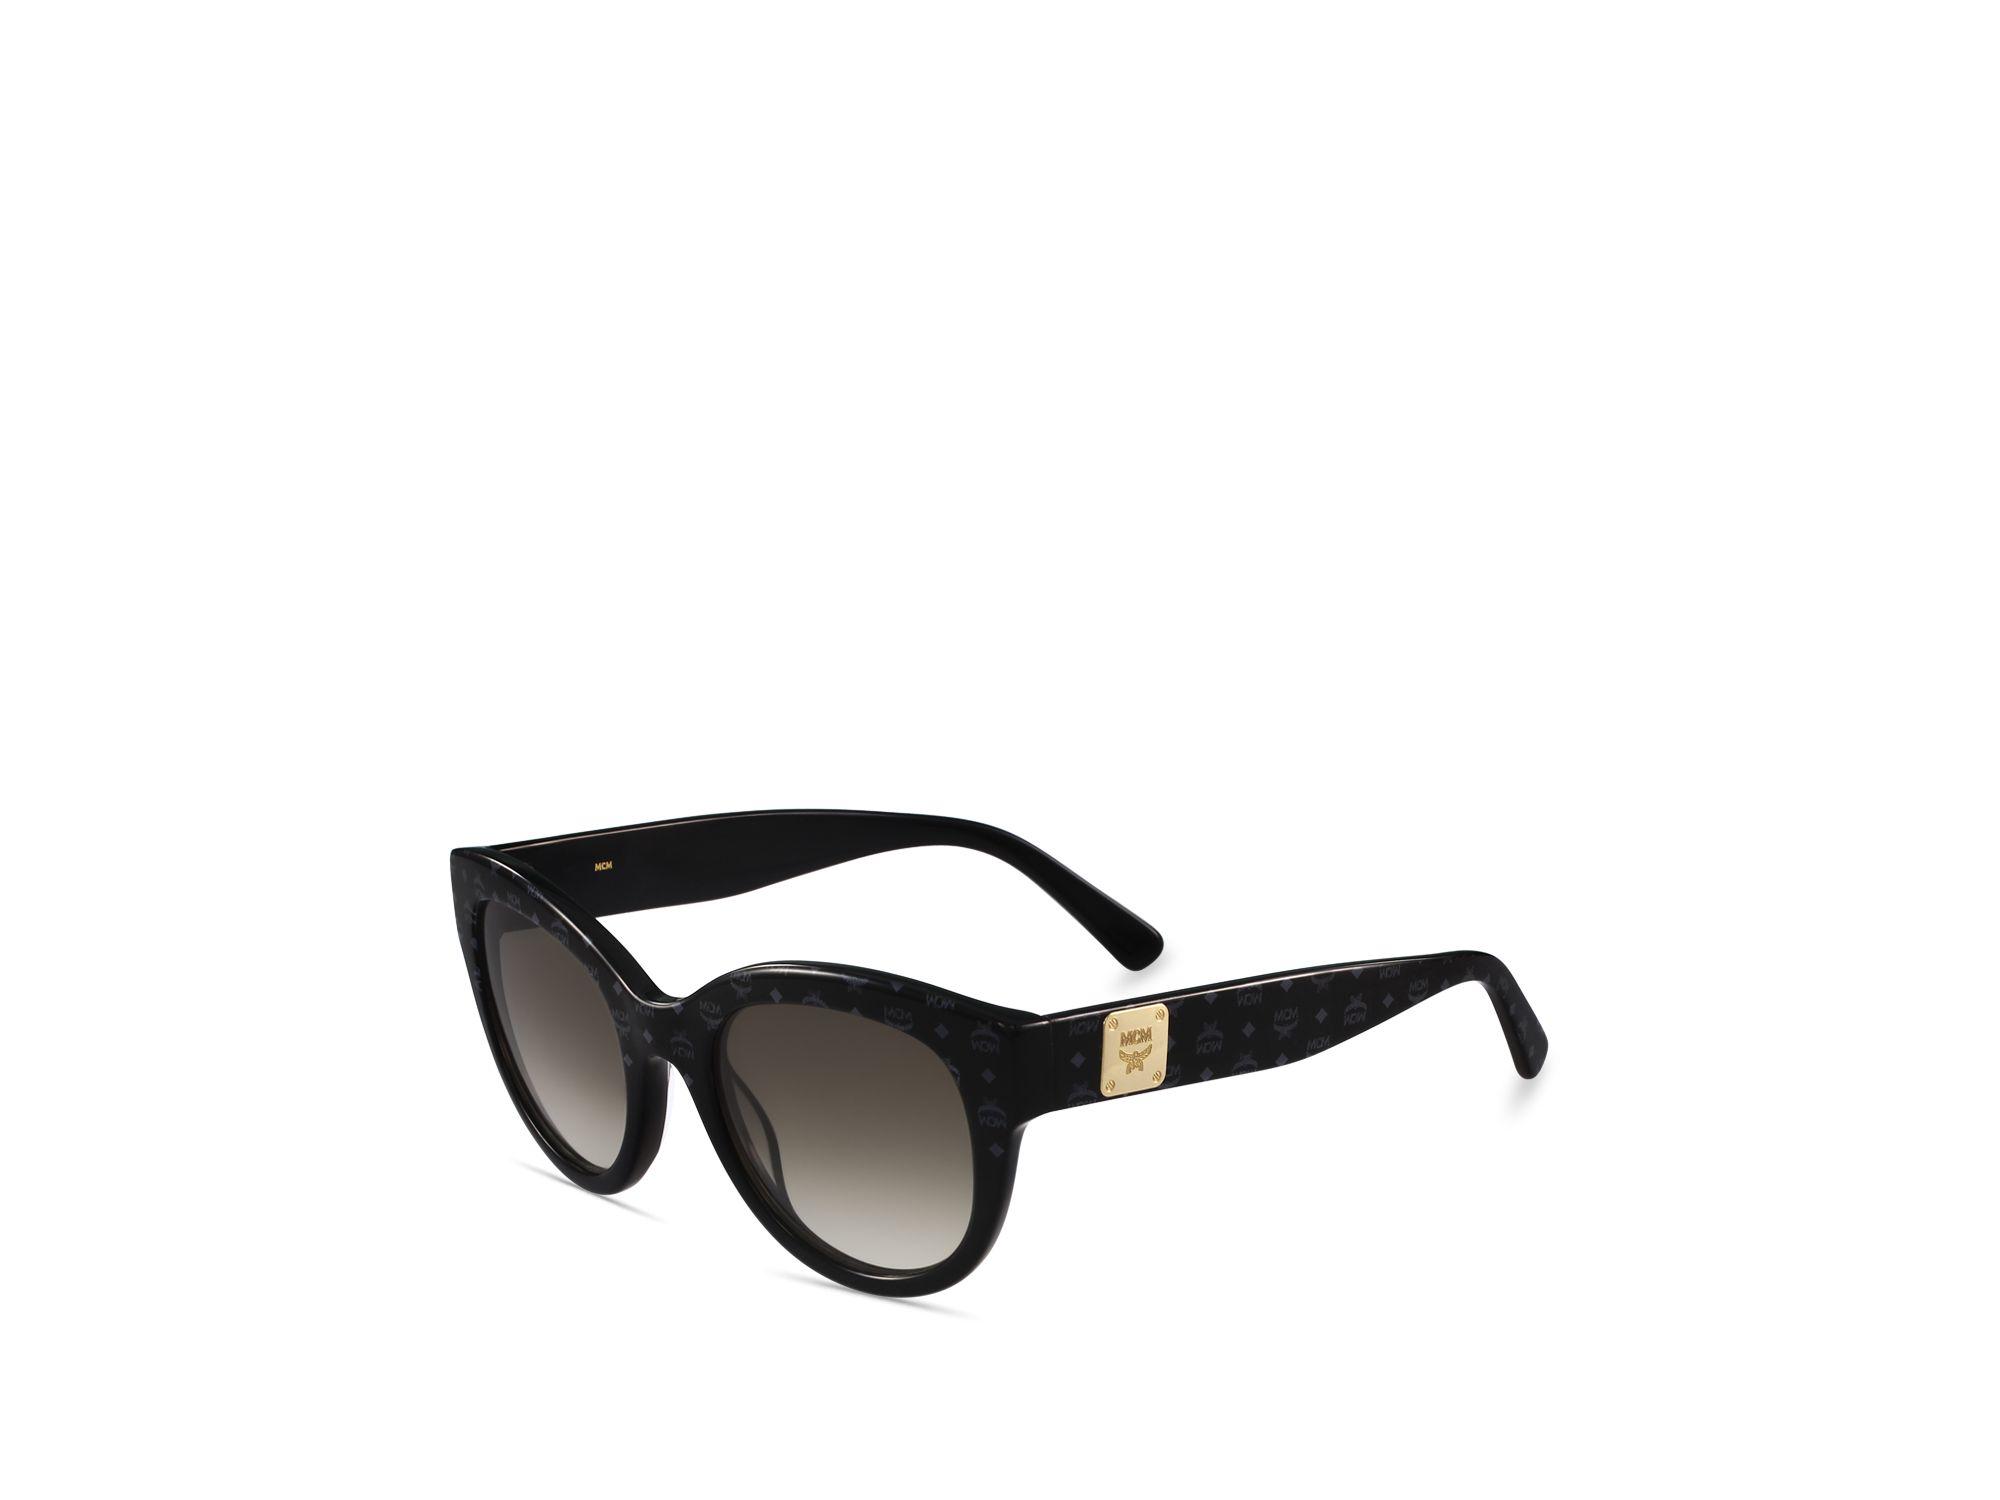 8dacffe9d06 mcm-black-visetosgray-gradient-lens-cateye-sunglasses -black-product-1-130239684-normal.jpeg